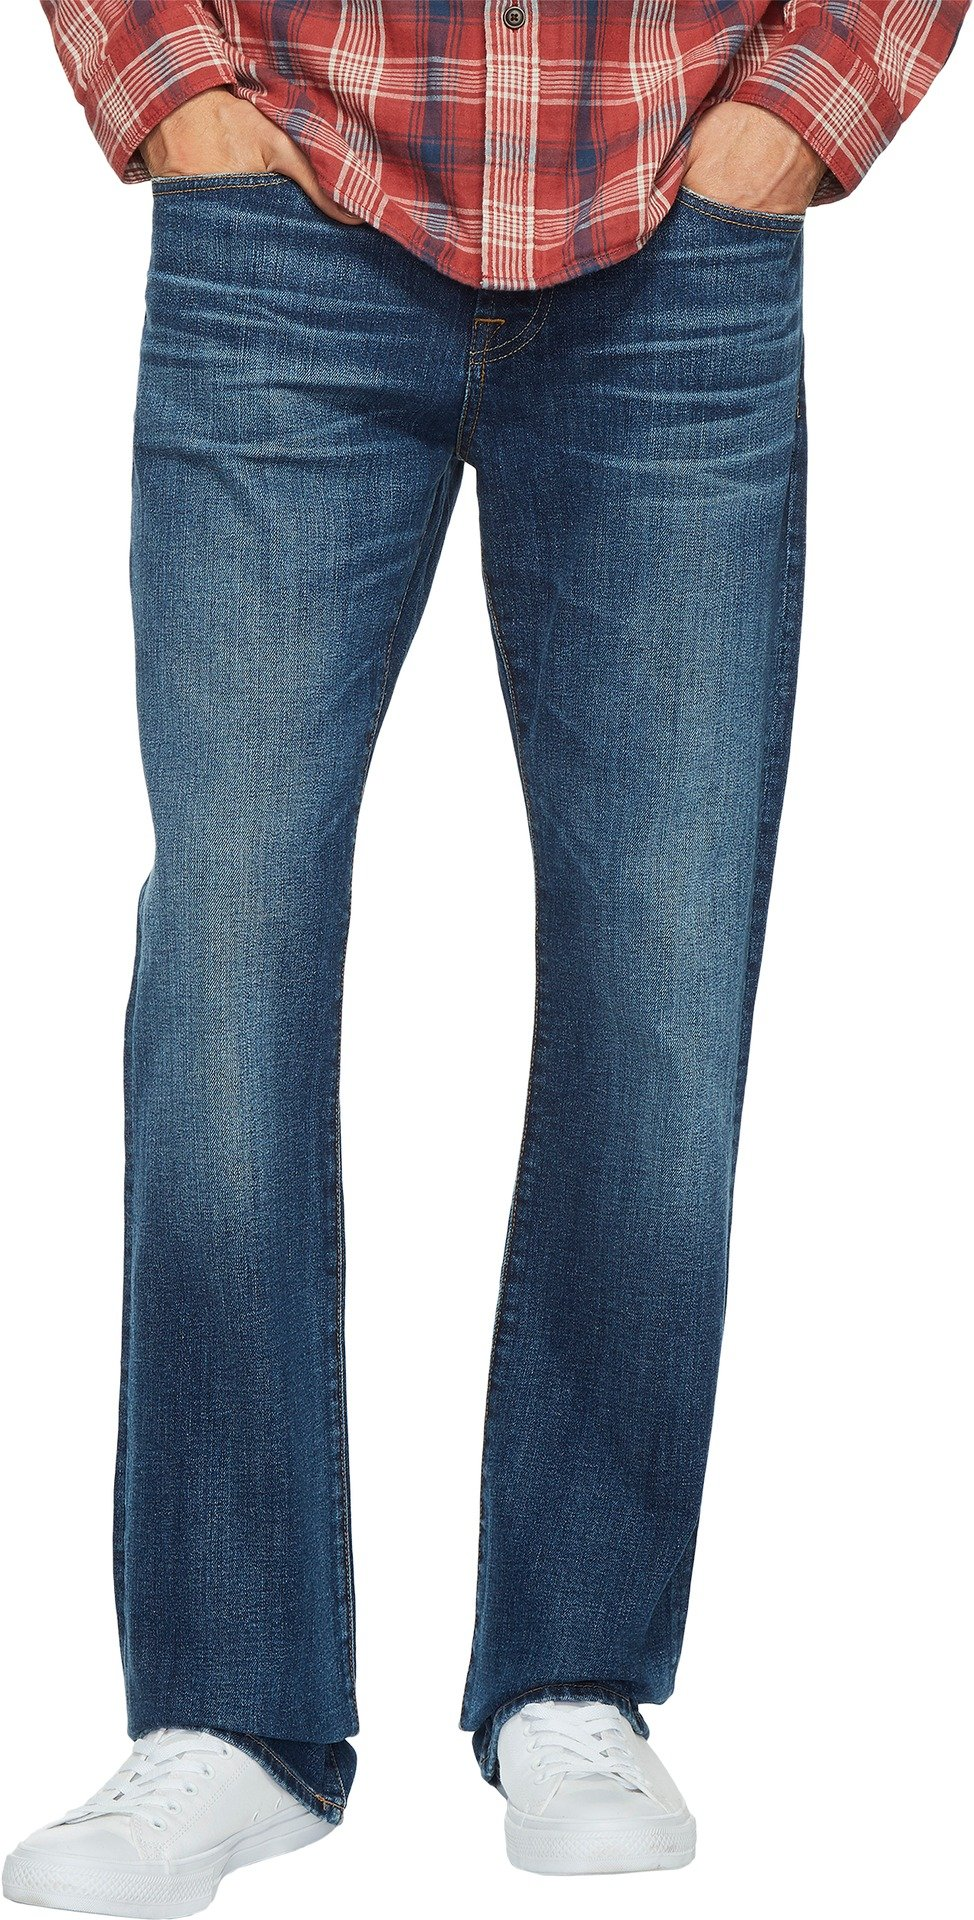 7 For All Mankind Men's Brett Bootcut Jean, Sixties Vintage, 31